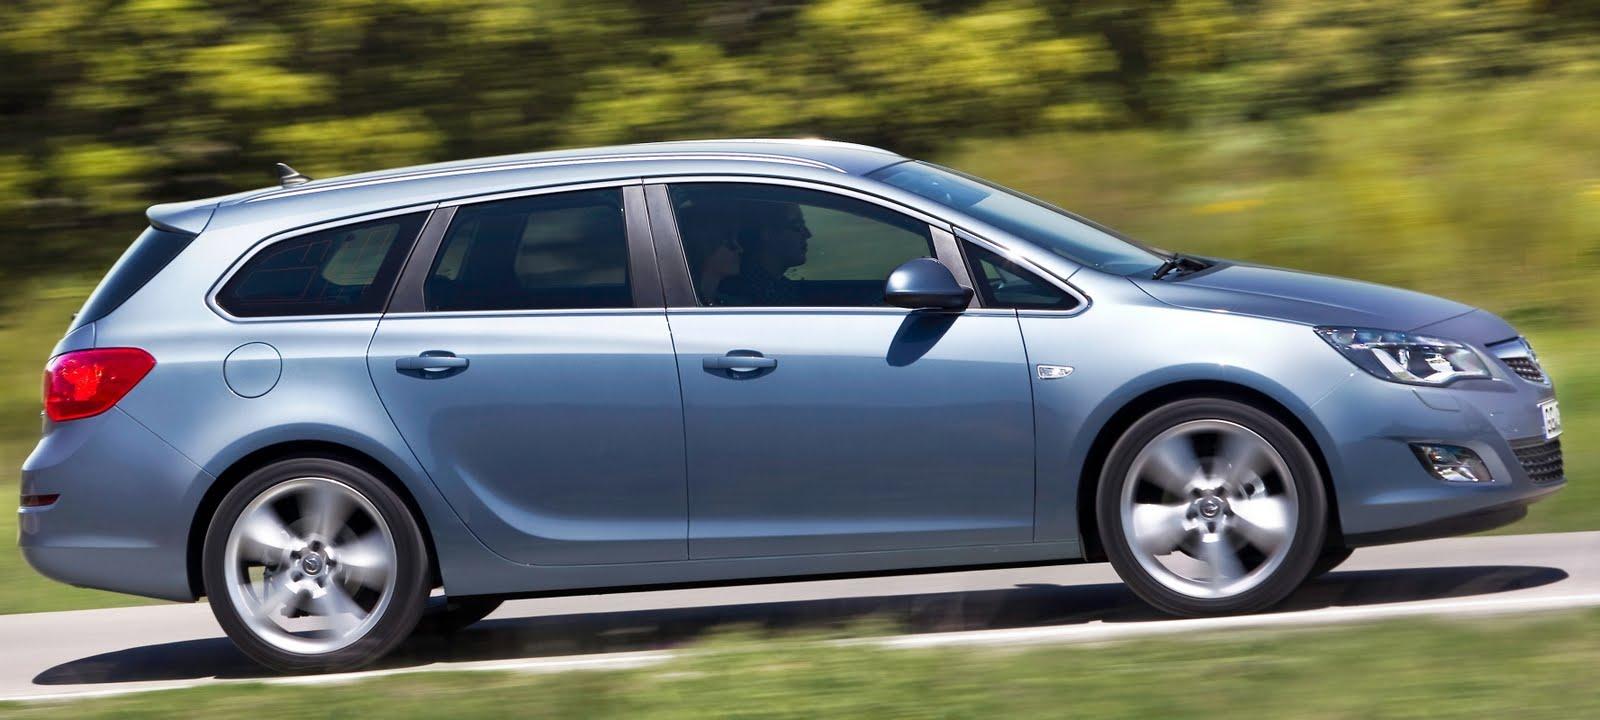 ... Auto: APRESENTAÇÃO: Opel Astra 1.3 CDTI com sistema Start/Stop